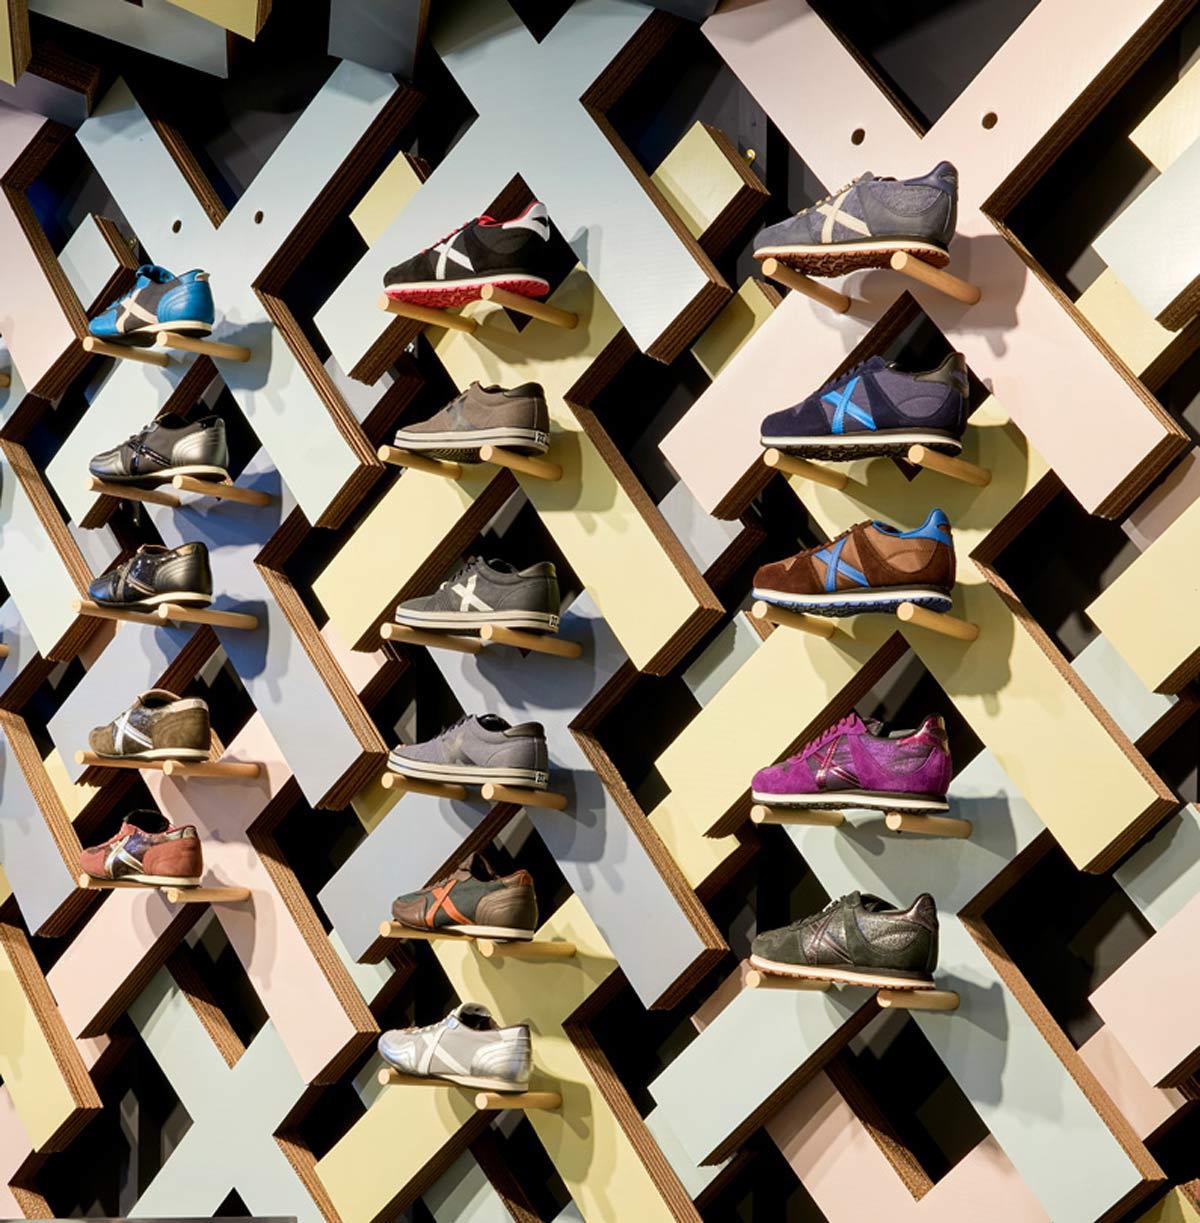 pop-up-zapatillas-shoes-munich-studio-animal-280x